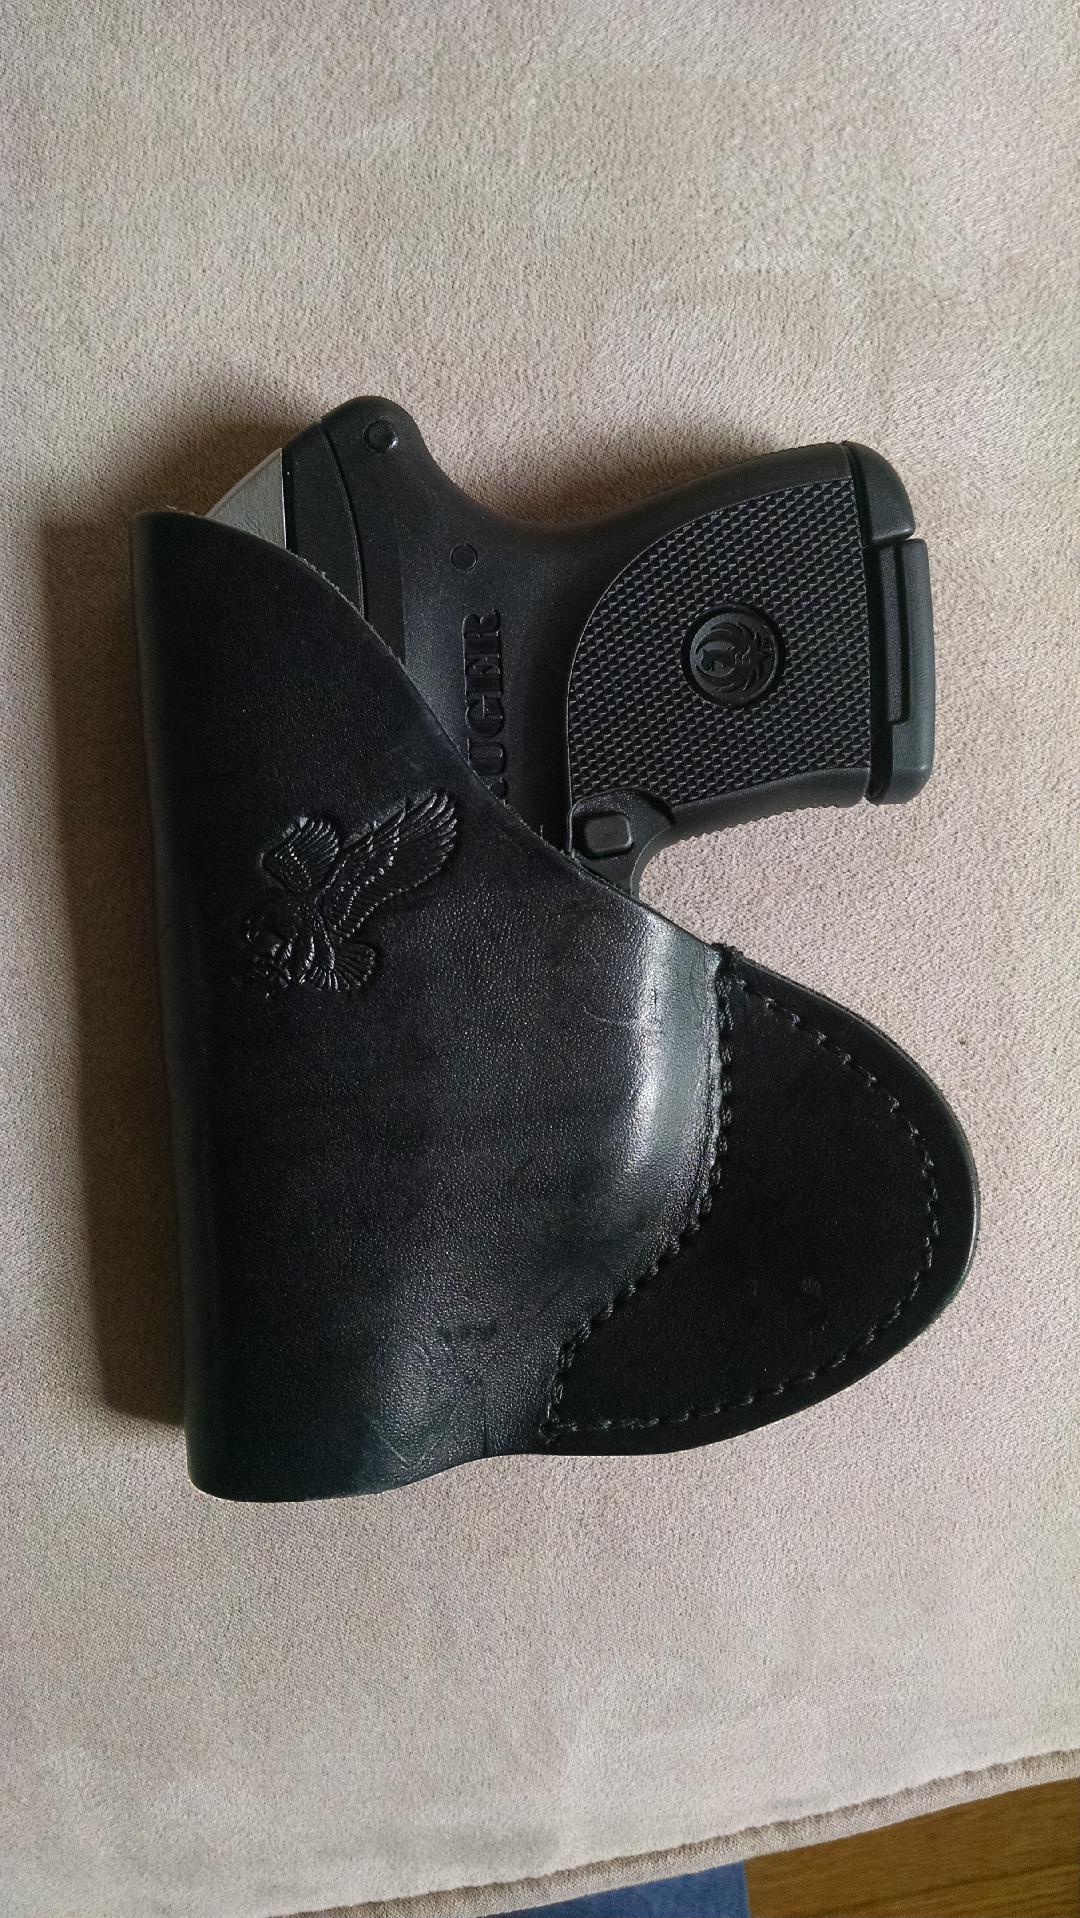 LCP Pocket holster-lcpbraidsholster2.jpg